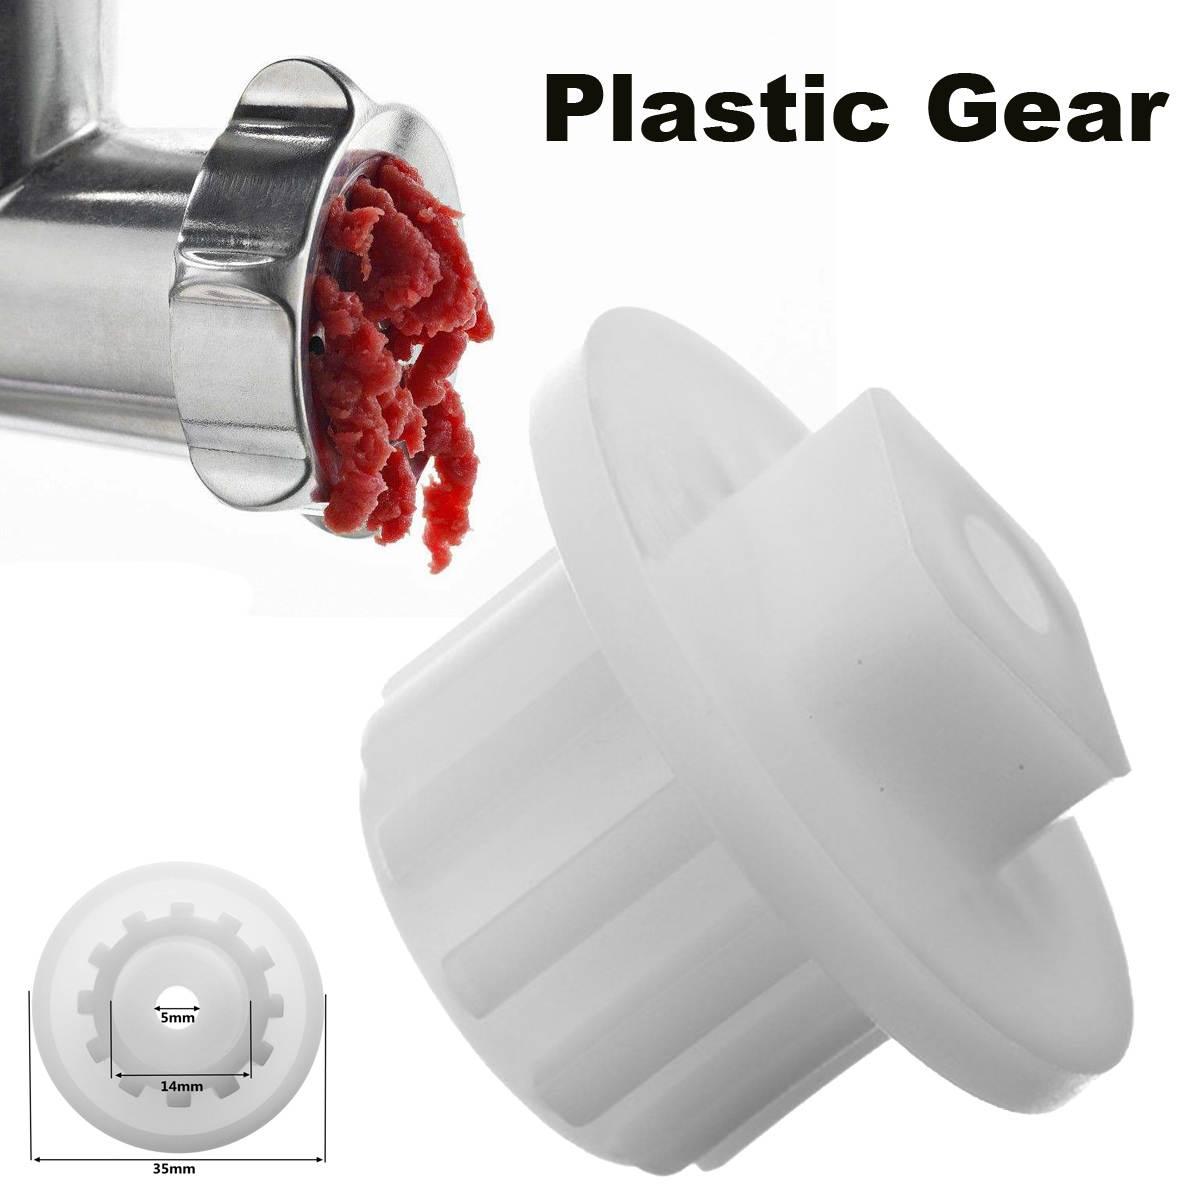 2019 New Arrival Meat Grinder Parts Plastic Gear Fit For Zelmer HR7752/HR7754/HR7768/HR2724/HR2725 Kitchen Appliance Parts